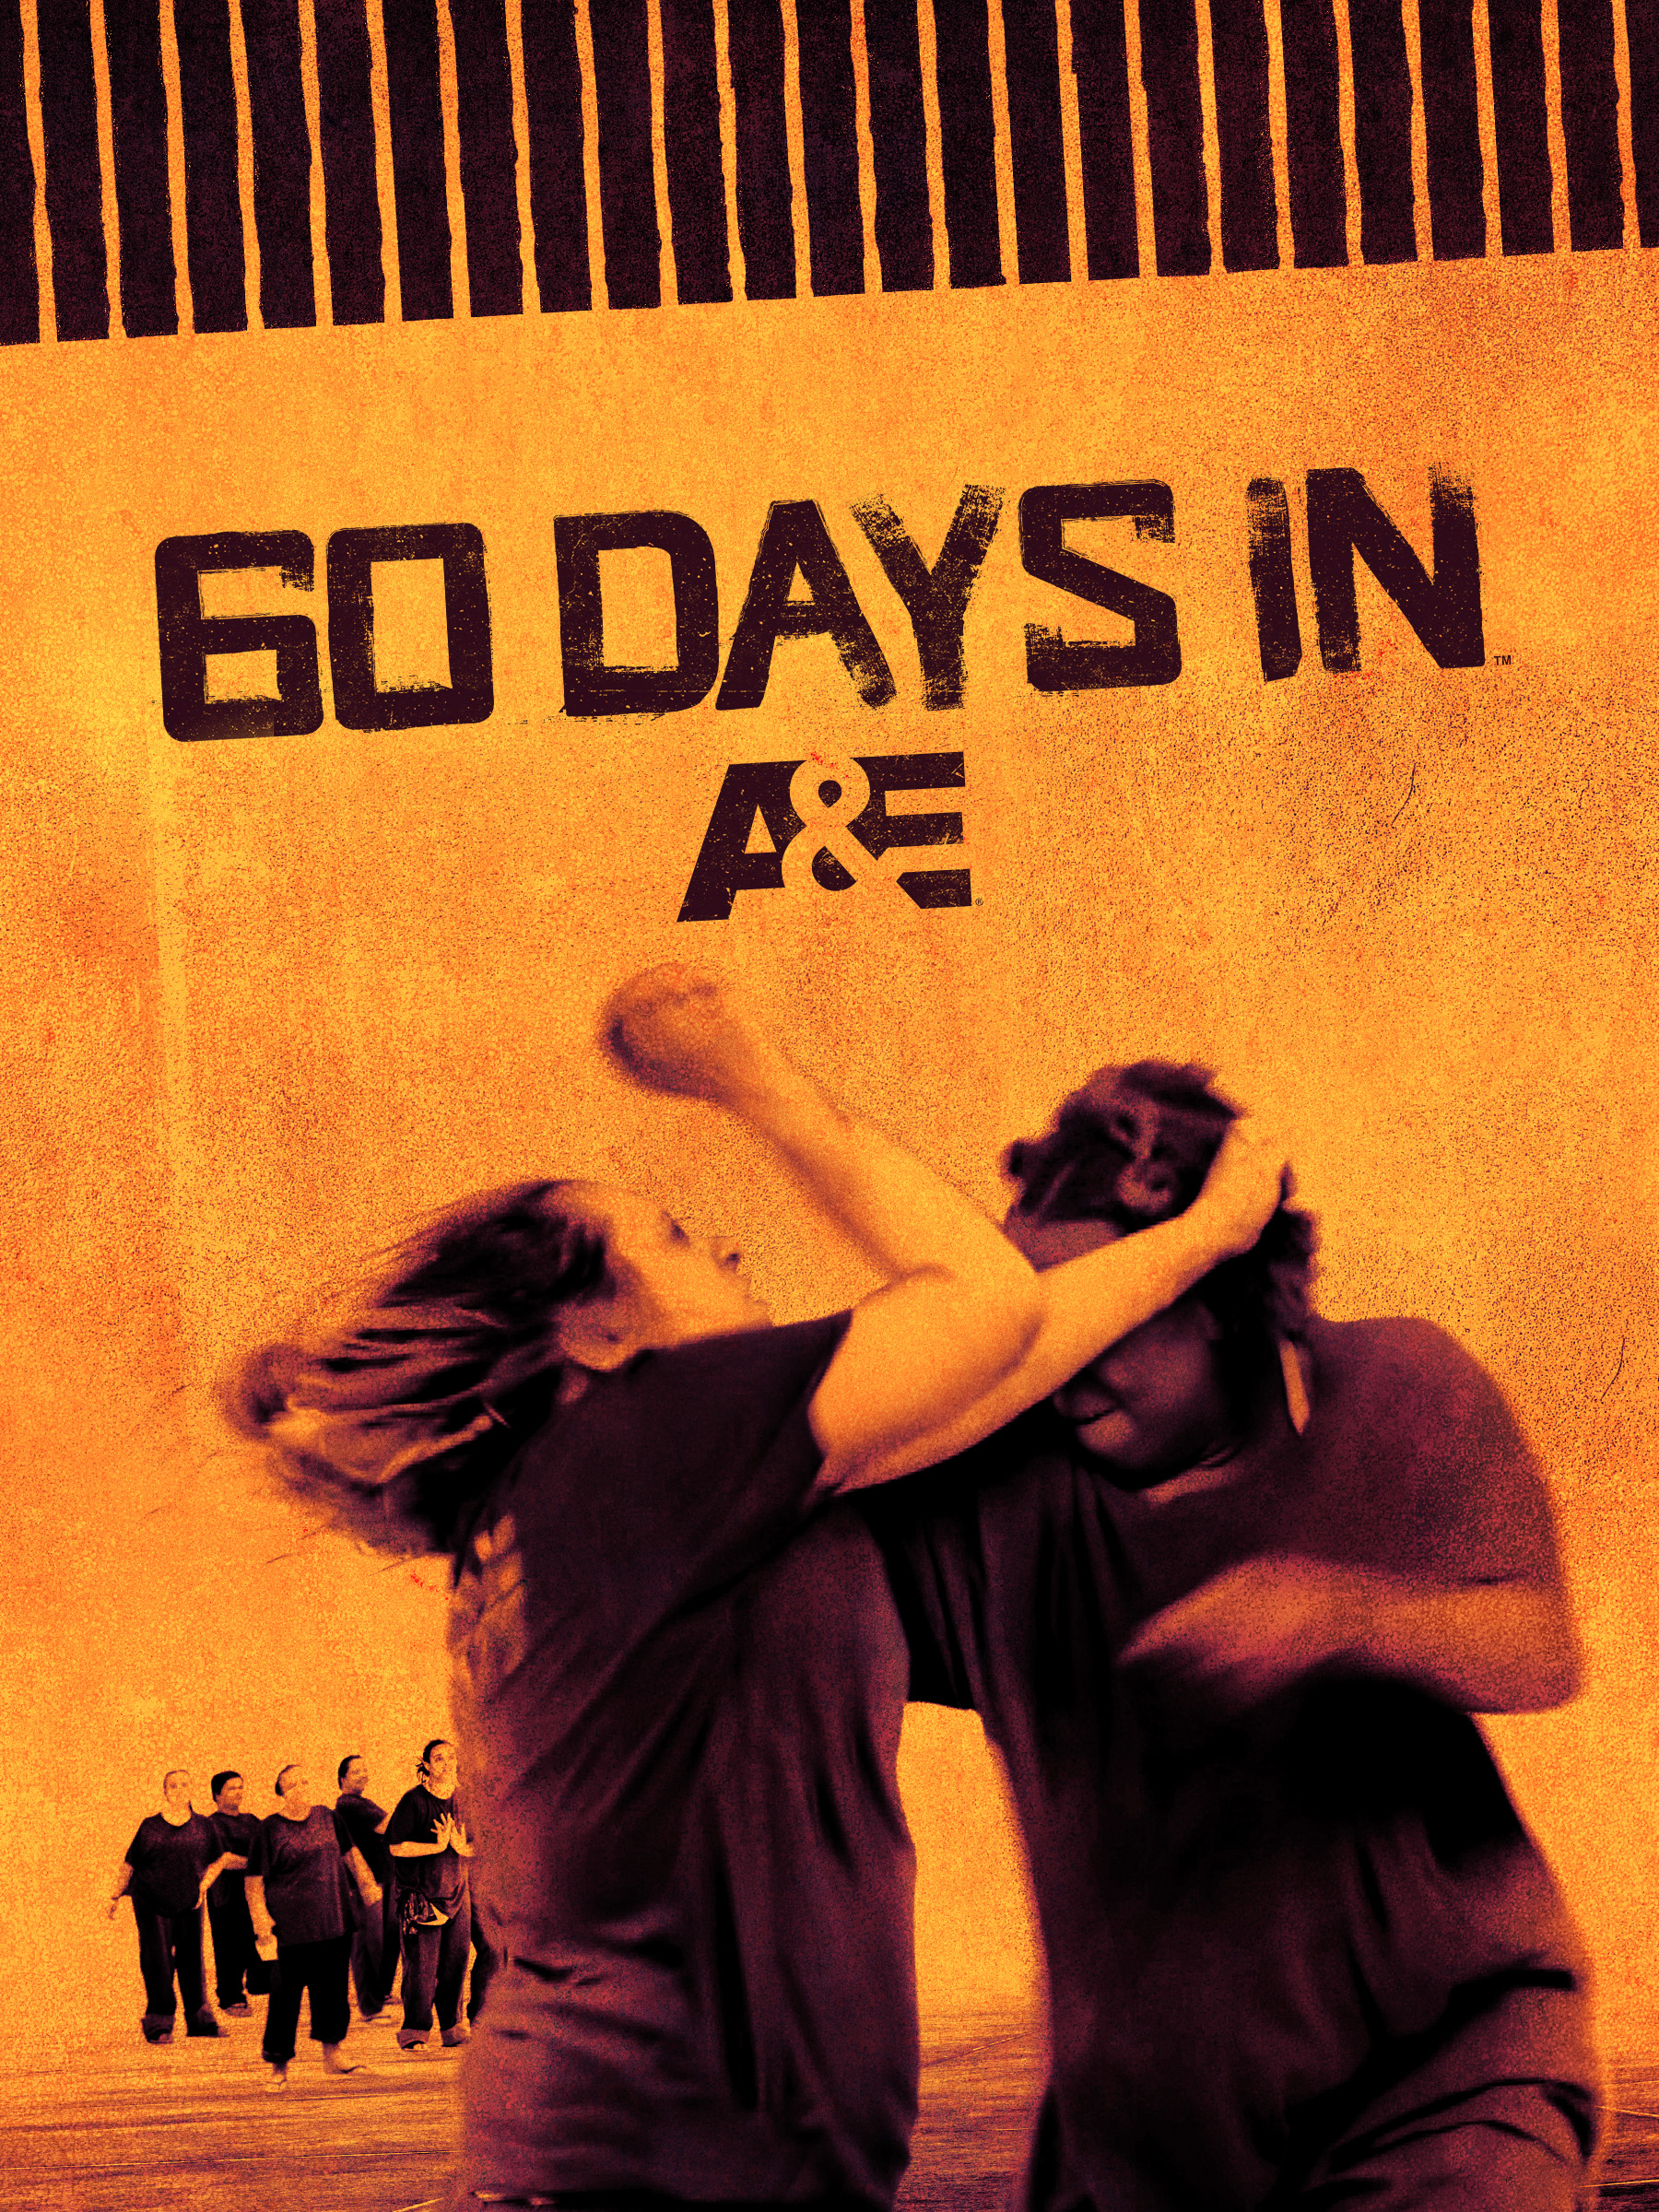 60.Days.In.S06E13.Girls.Next.Door.720p.HDTV.x264-CRiMSON